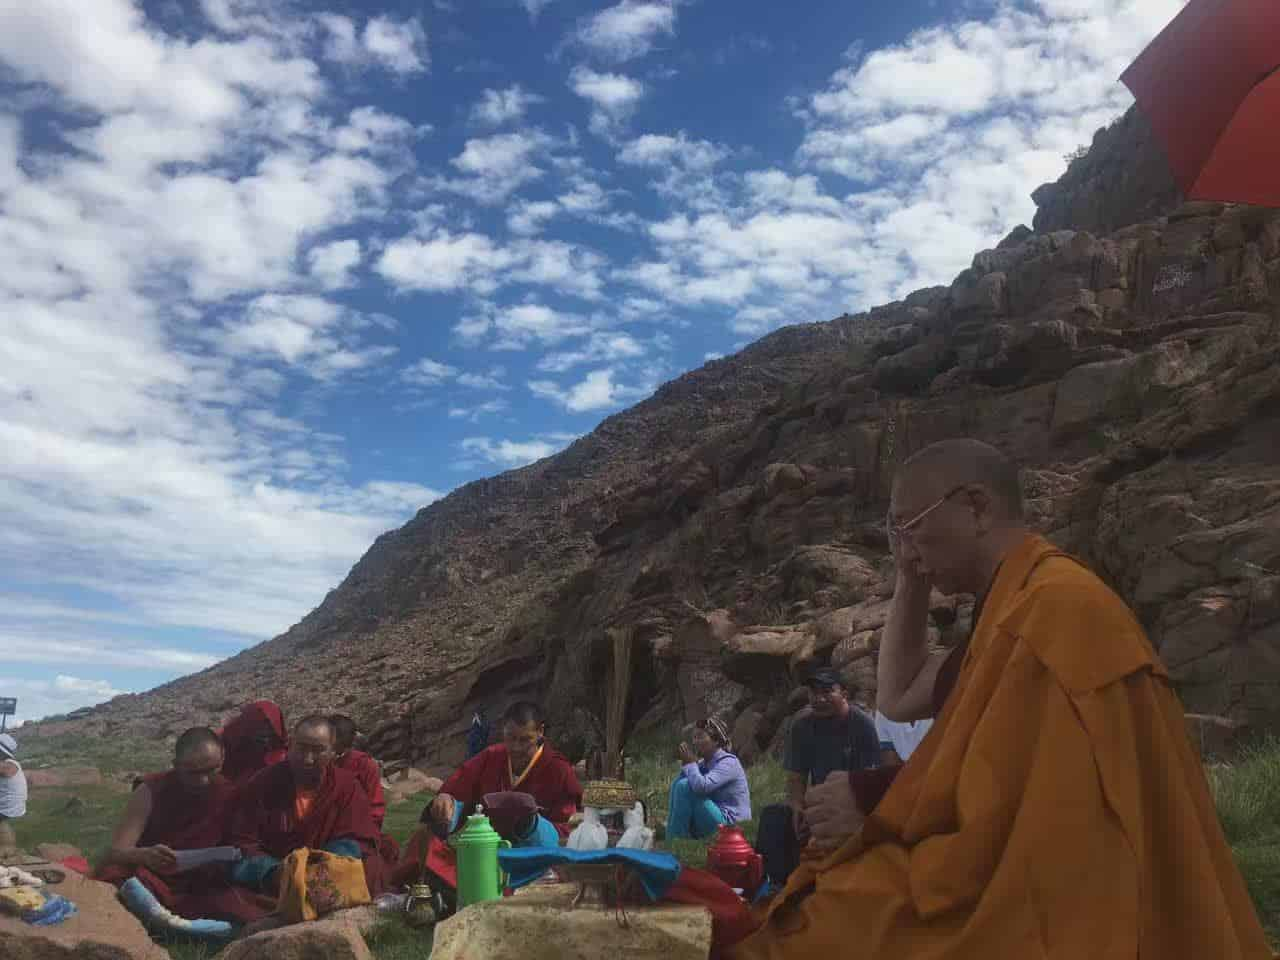 gosok-rinpoche-mongolia-2016-b9afb3a8a04794c2fec549de61fceee